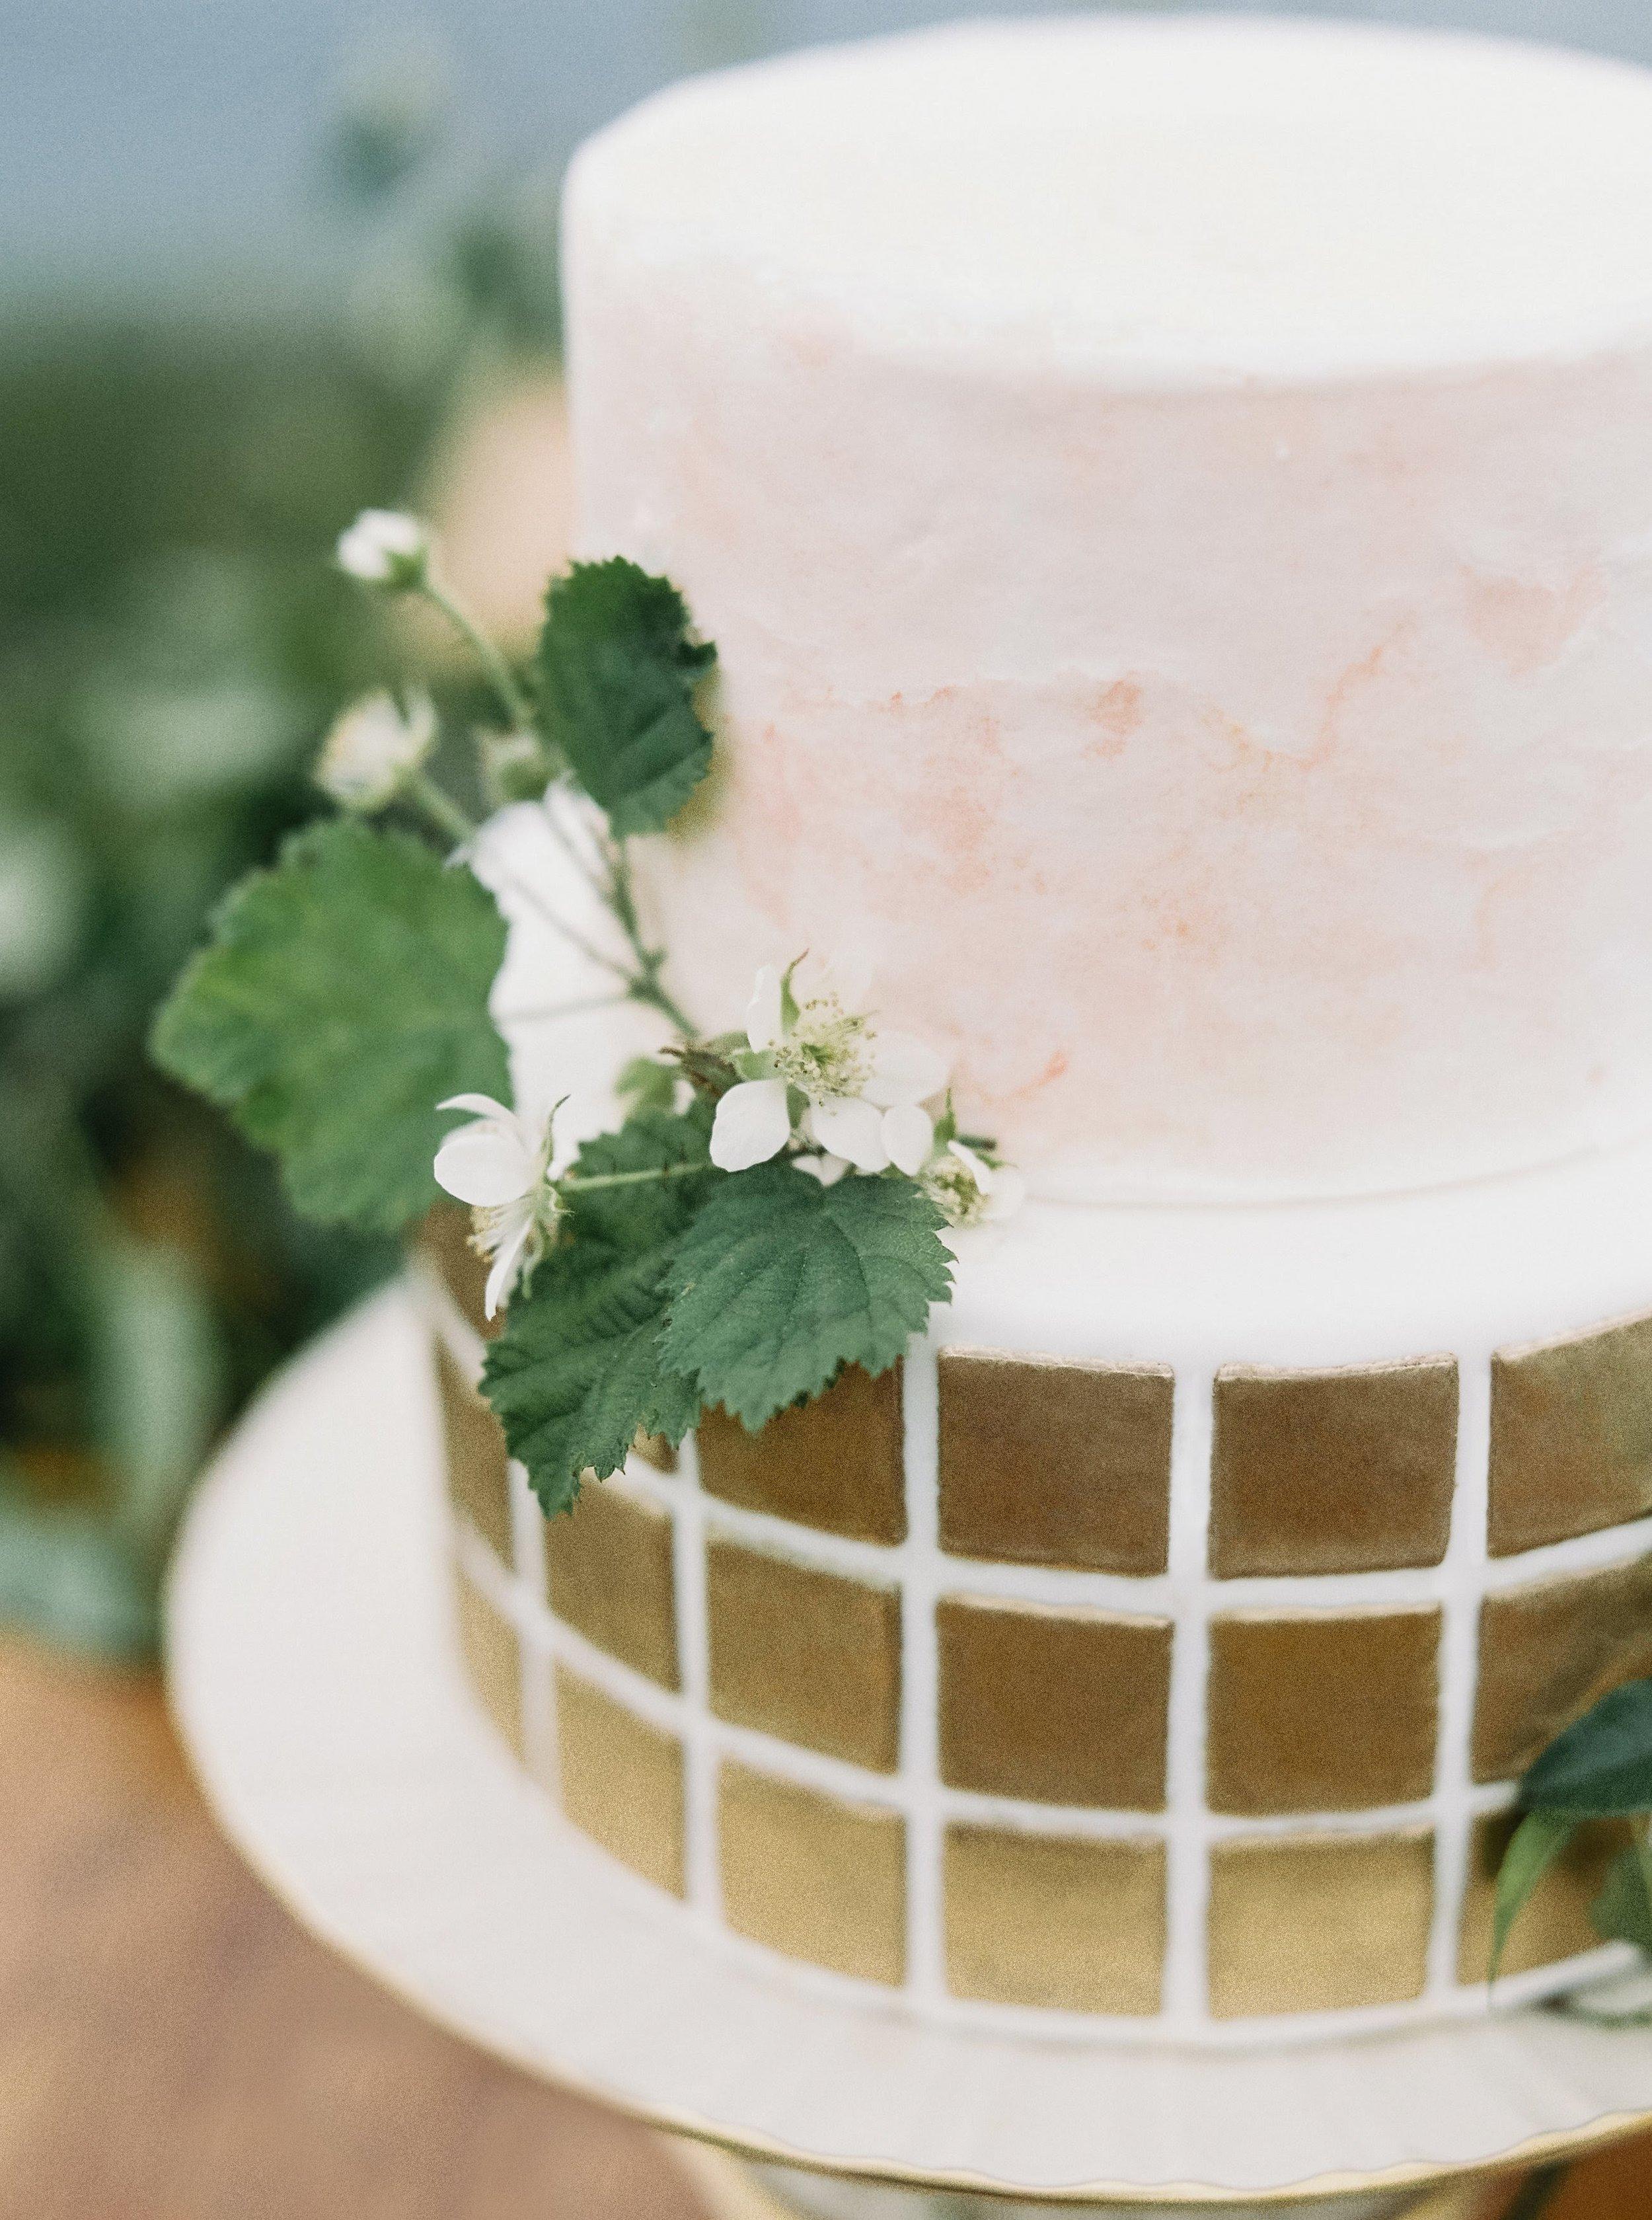 fondant-cakes07.jpg